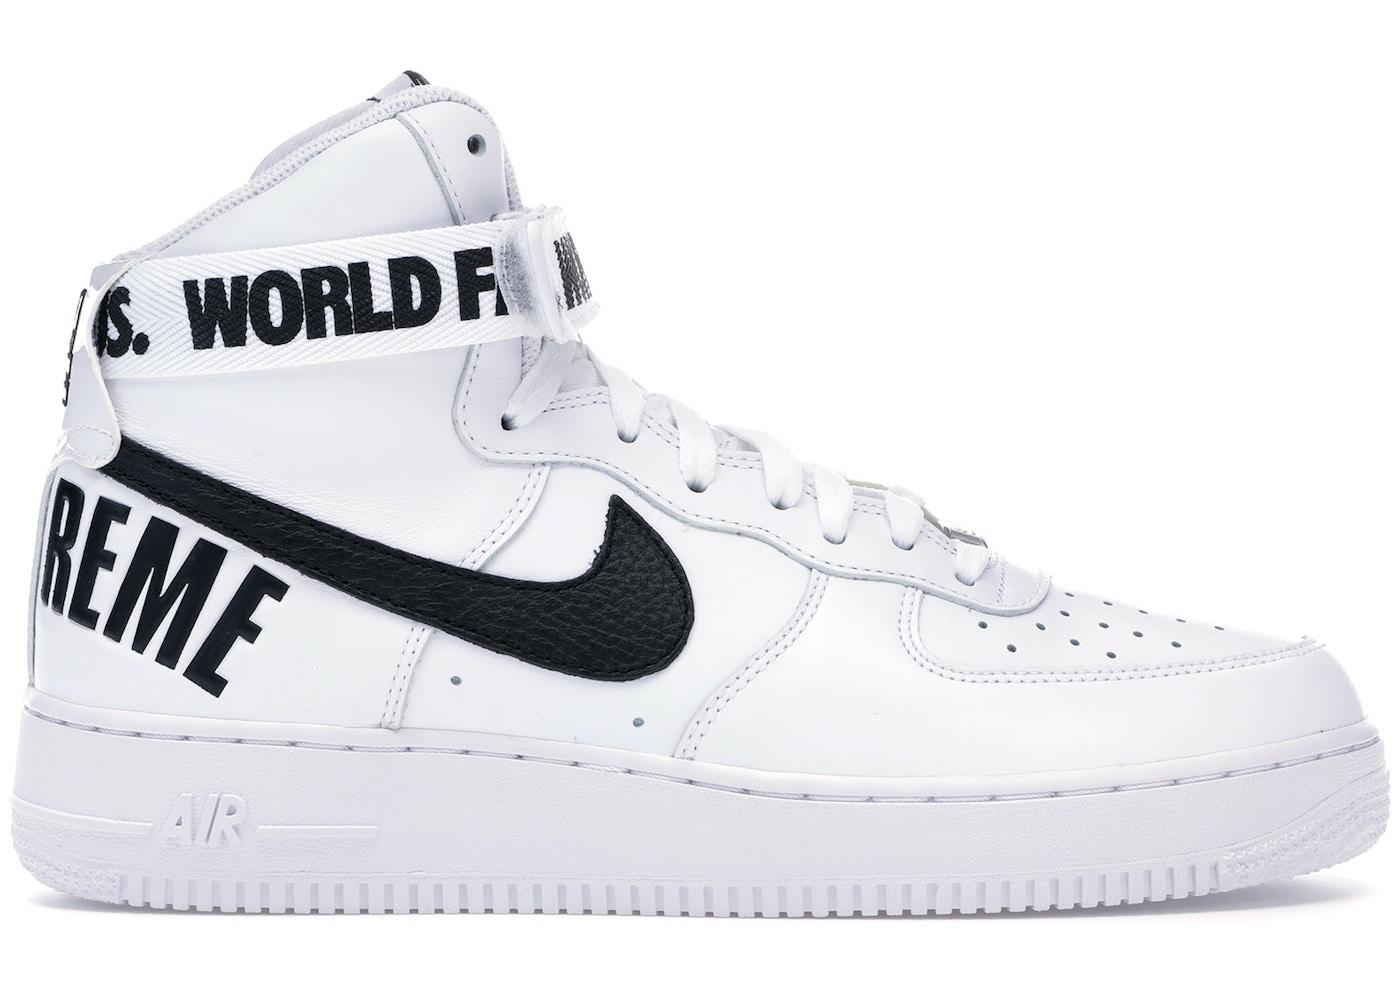 sale retailer 58e83 de463 Nike Air Force 1 Shoes - Highest Bid